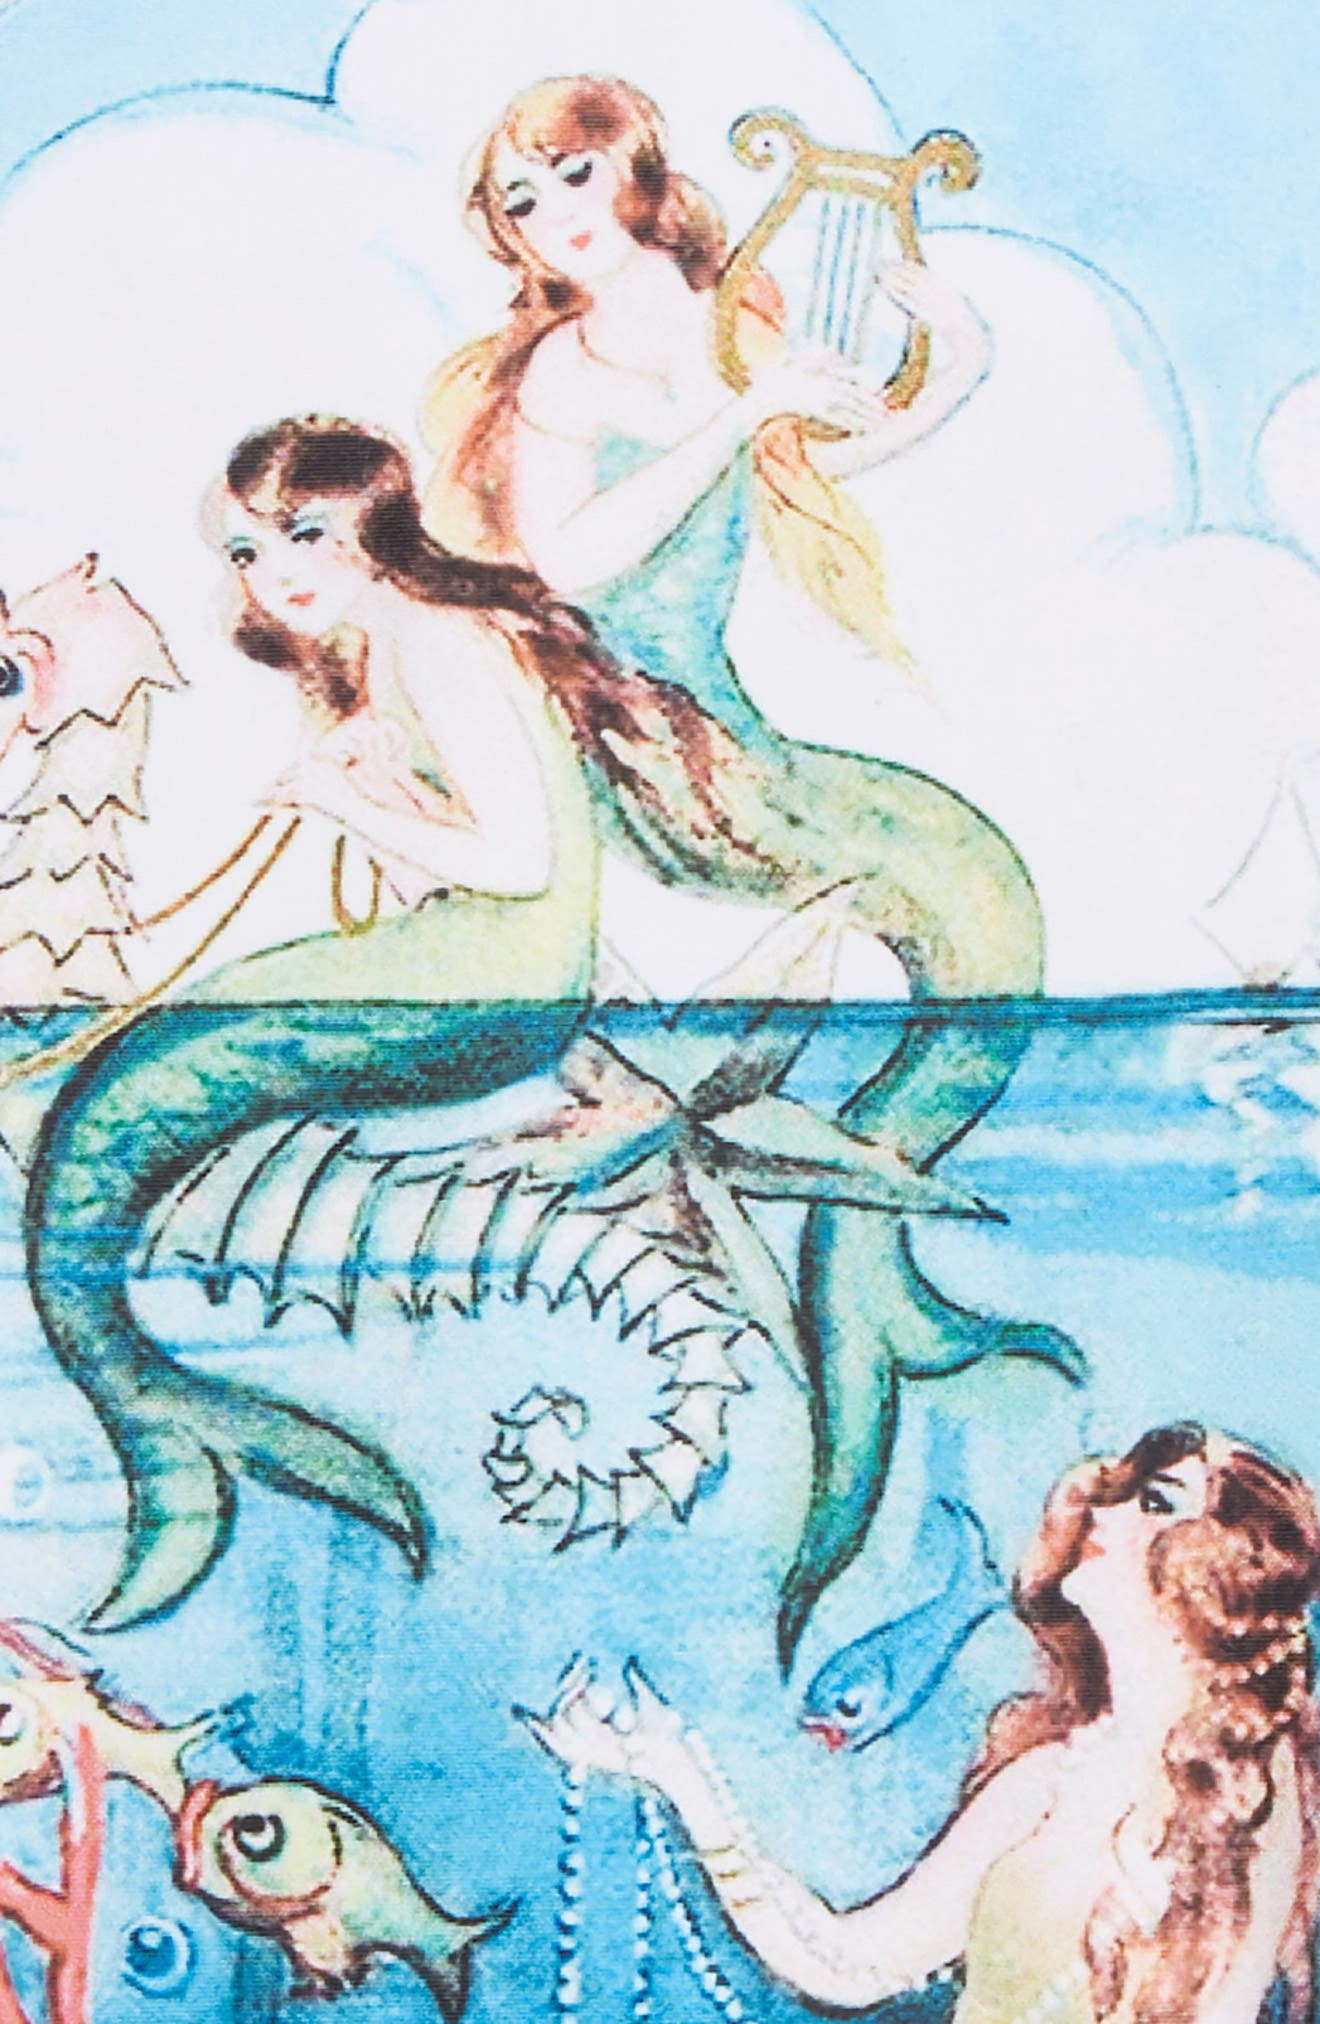 Little Mermaids One-Piece Swimsuit,                             Alternate thumbnail 2, color,                             400